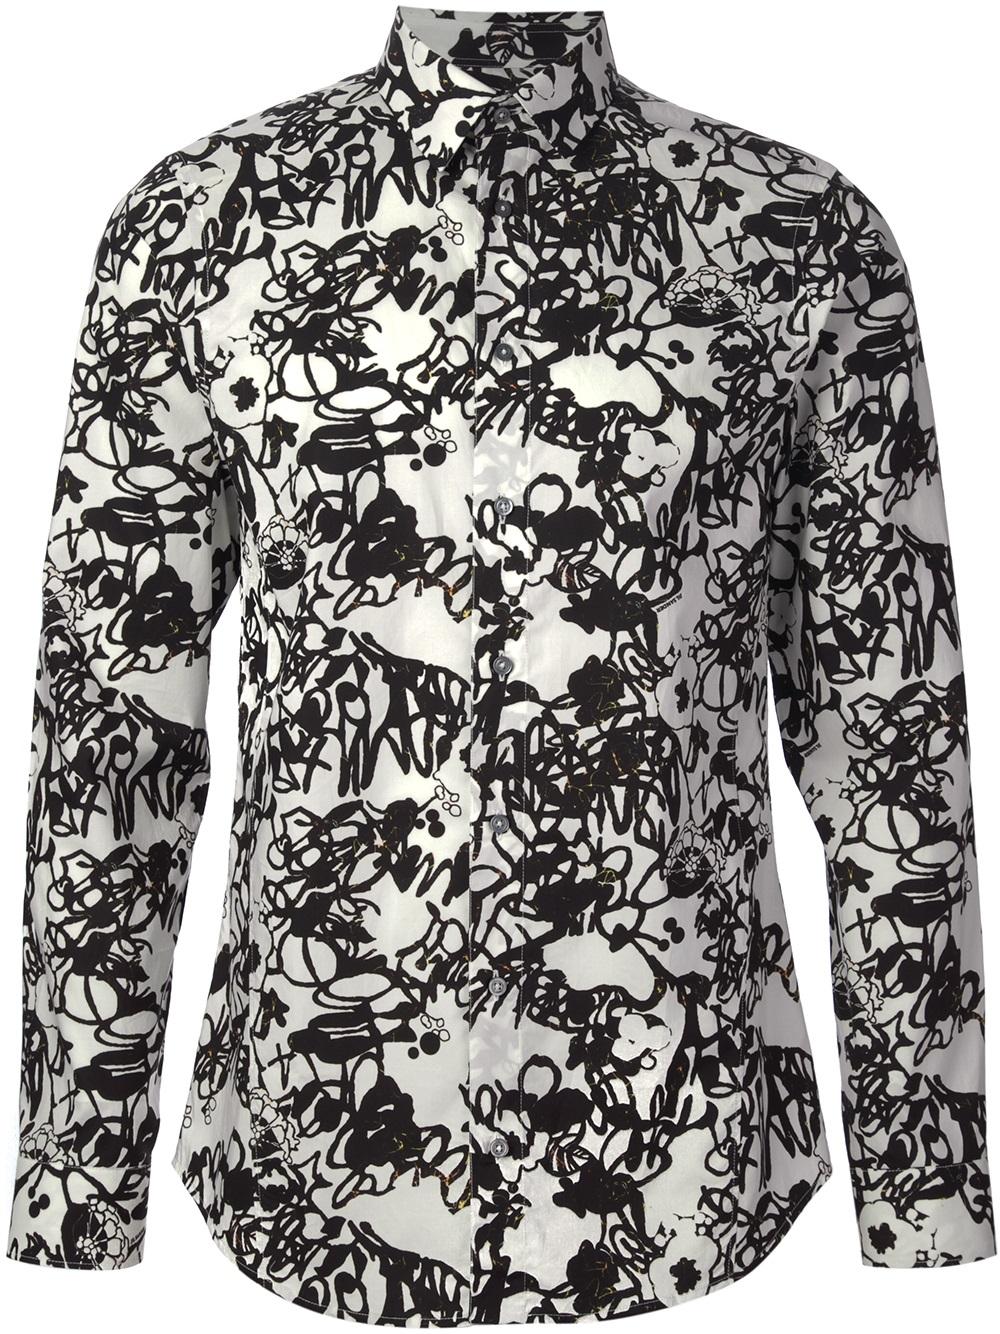 Mens black floral print dress shirt rldm mens black floral print dress shirt mightylinksfo